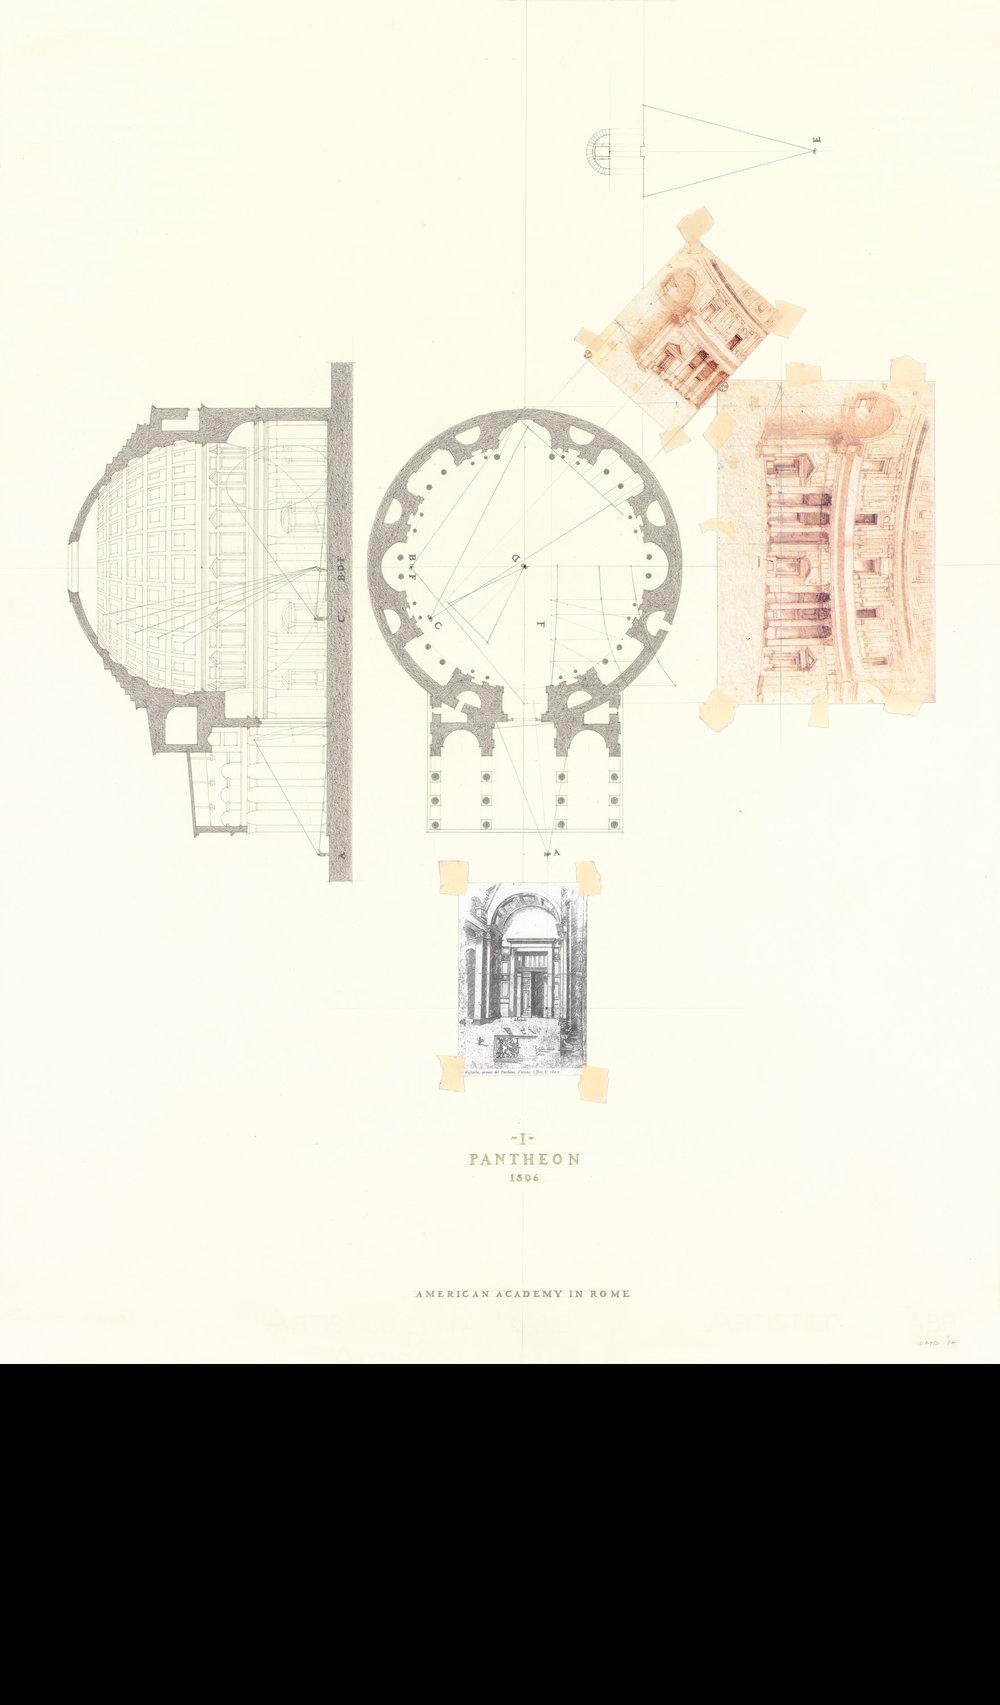 Pantheon - Finished